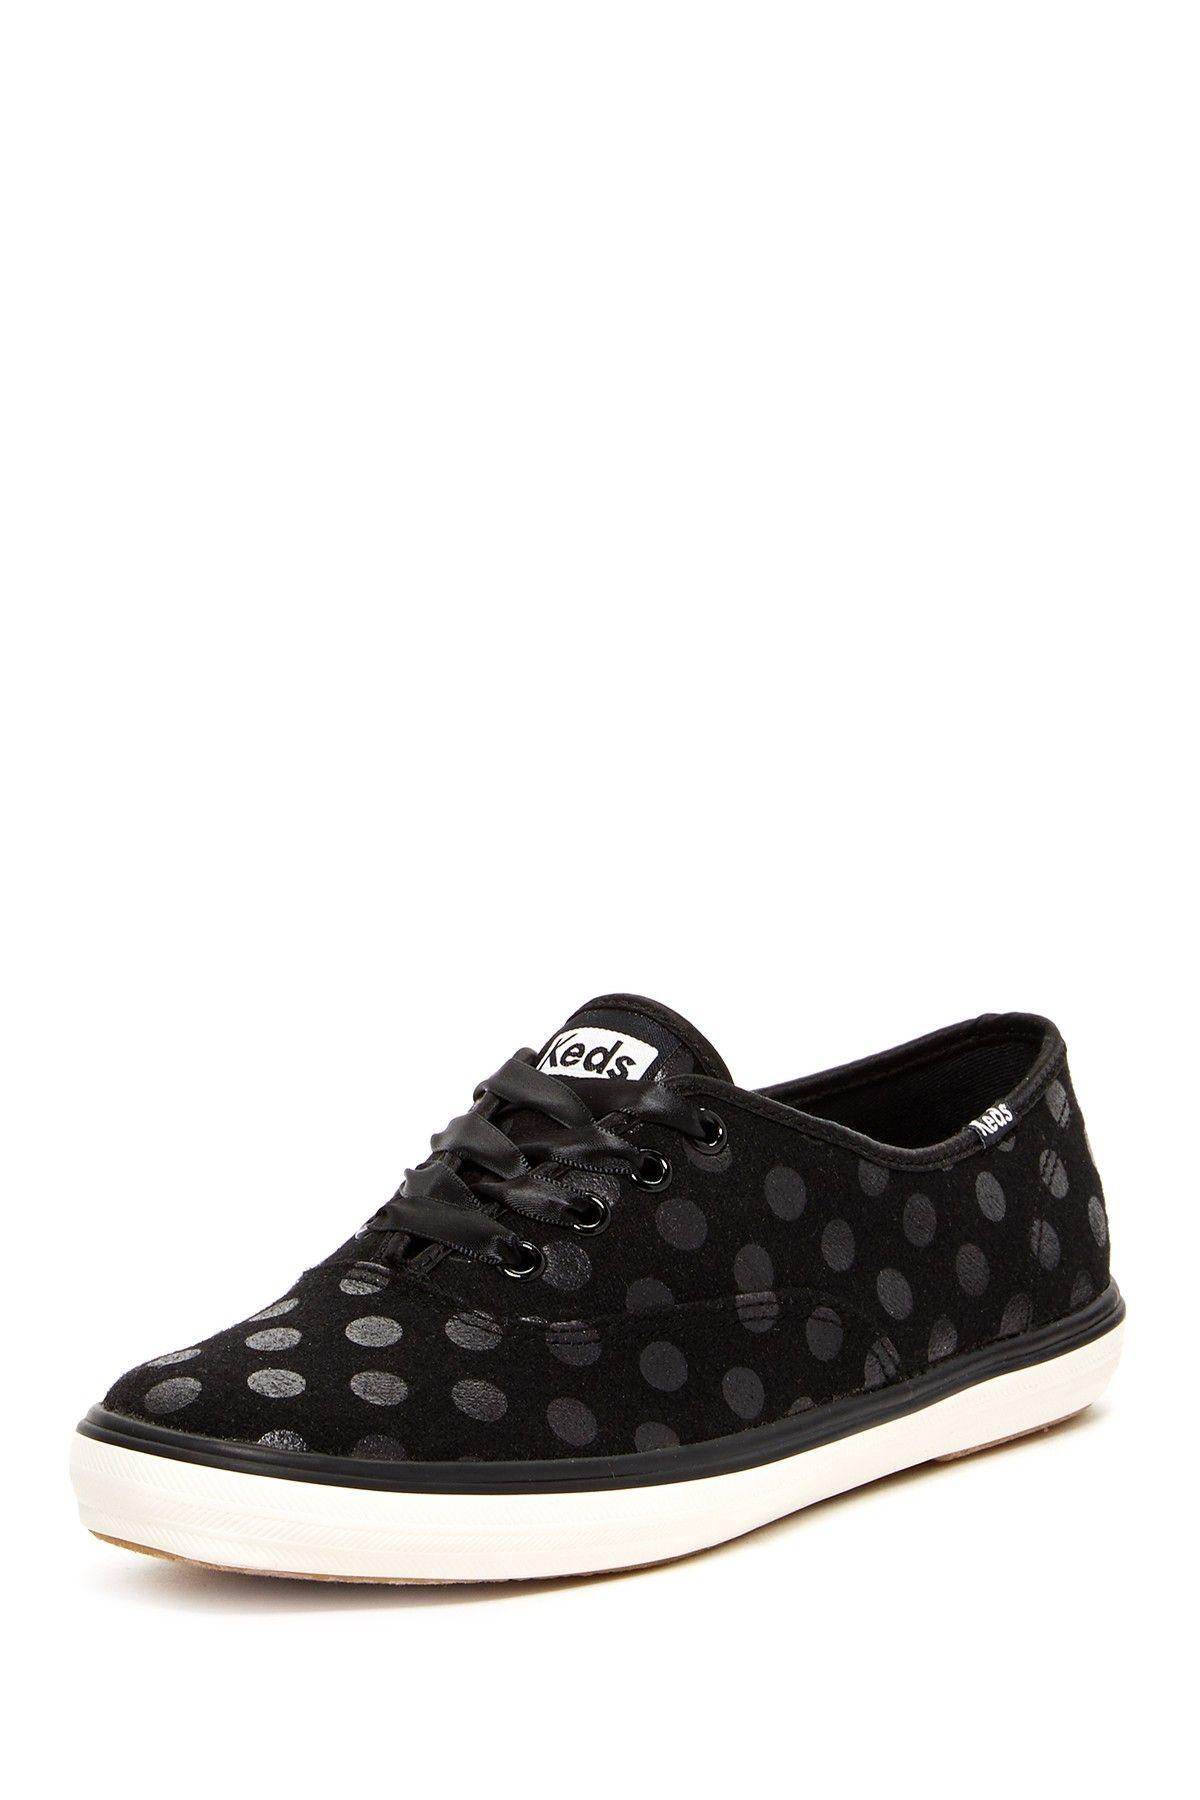 c4f806c4b7f4 Keds Champion Wool Blend Dot Lace-Up Sneaker